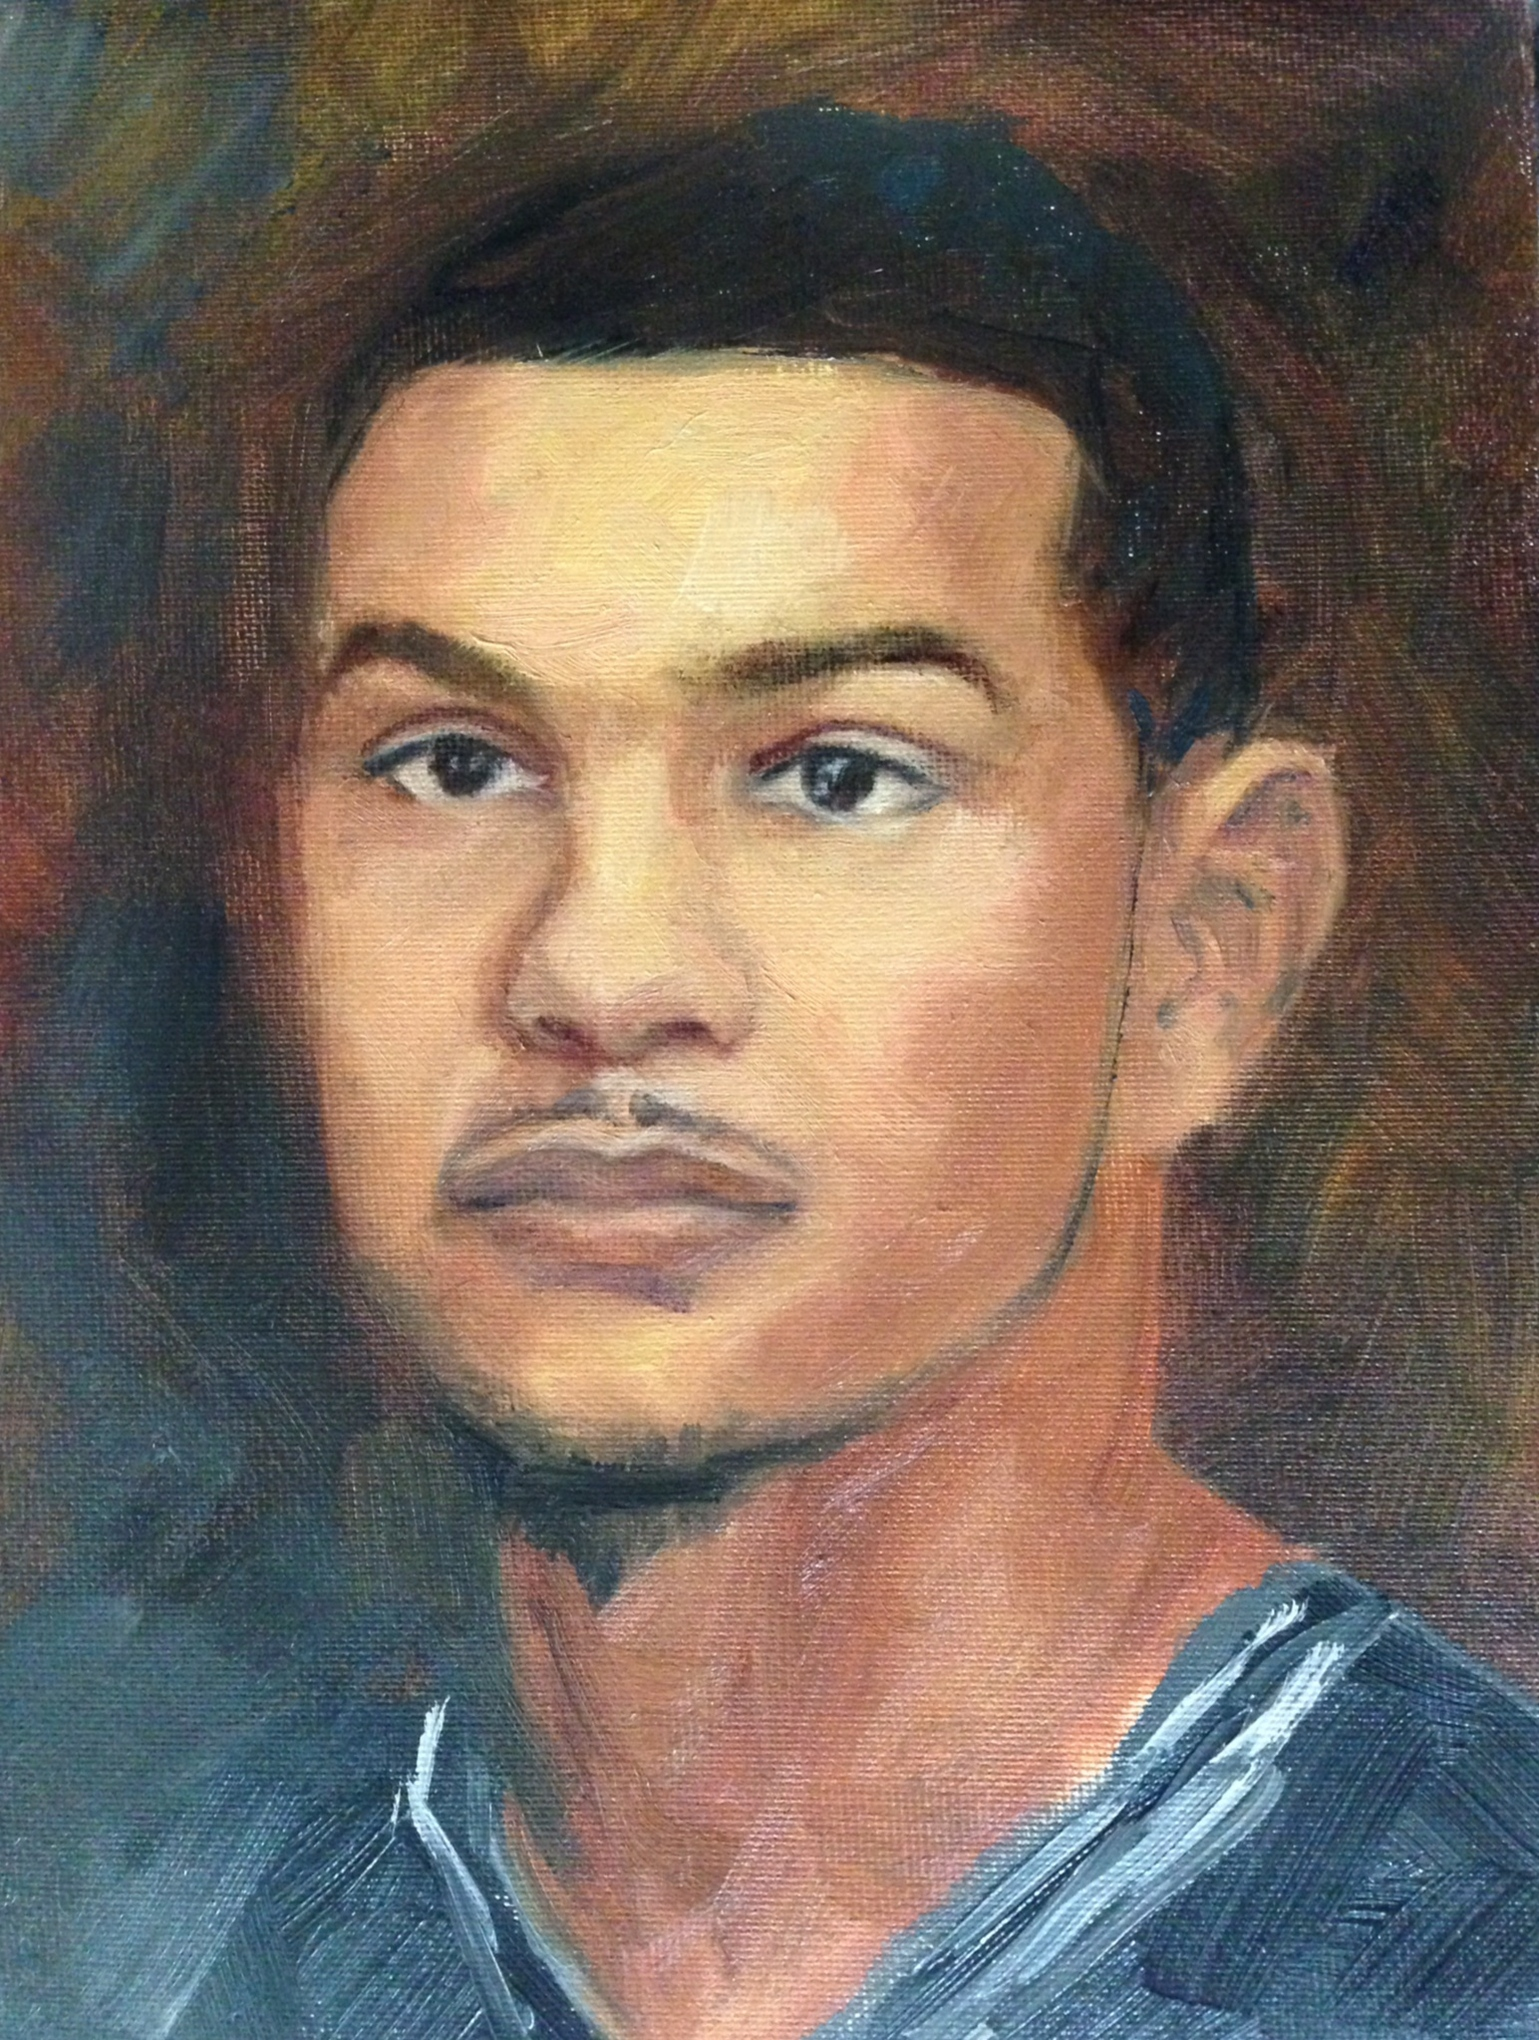 Cory Joseph - oil on canvas